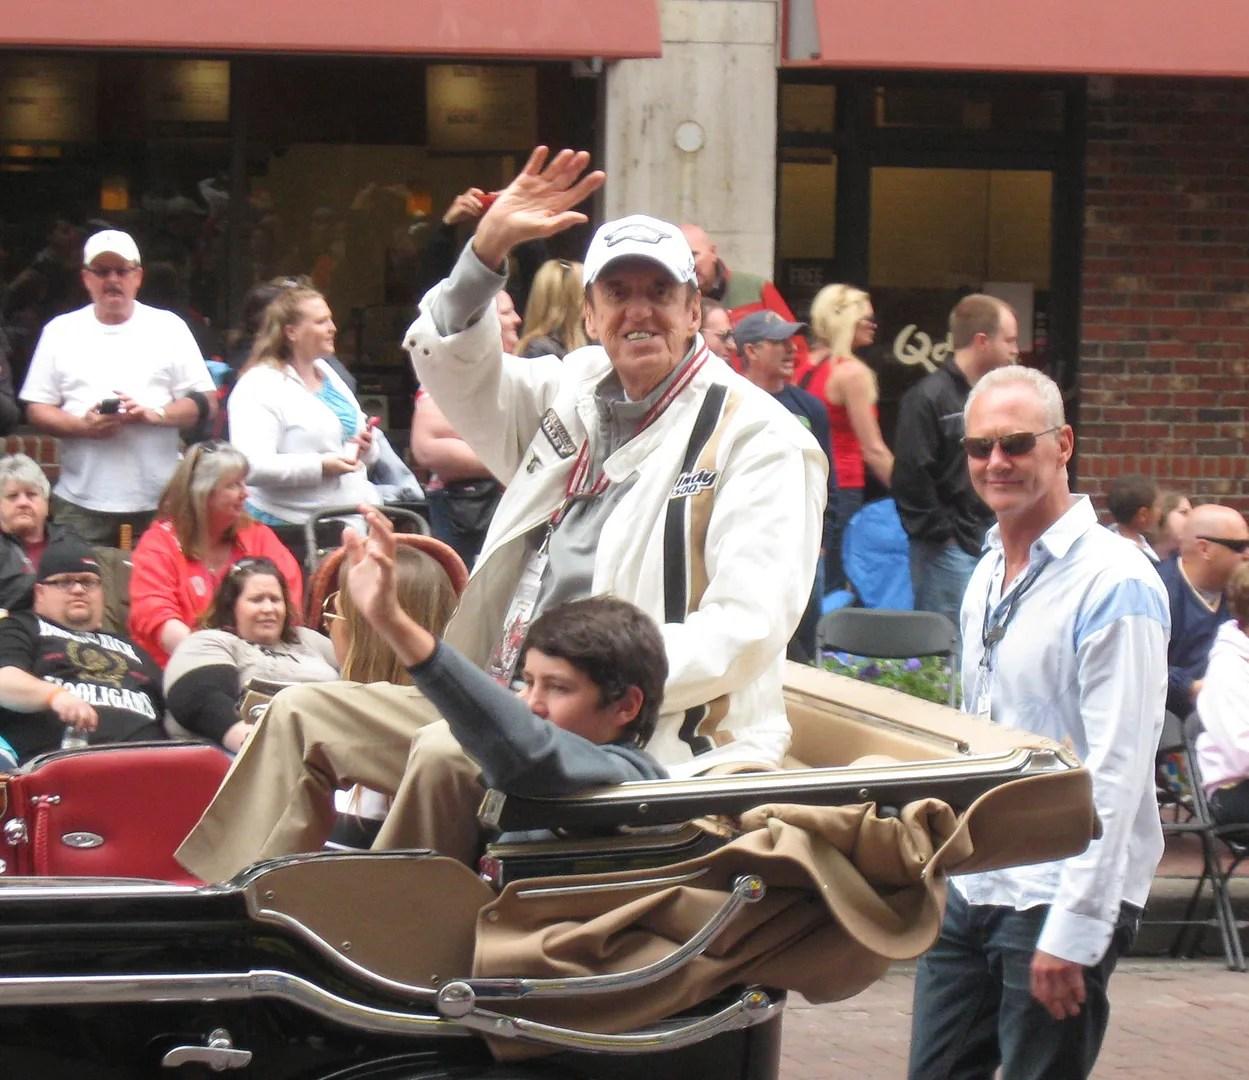 Jim Nabors, Gomer Pyle, 500 Festival Parade, Indianapolis, 2013